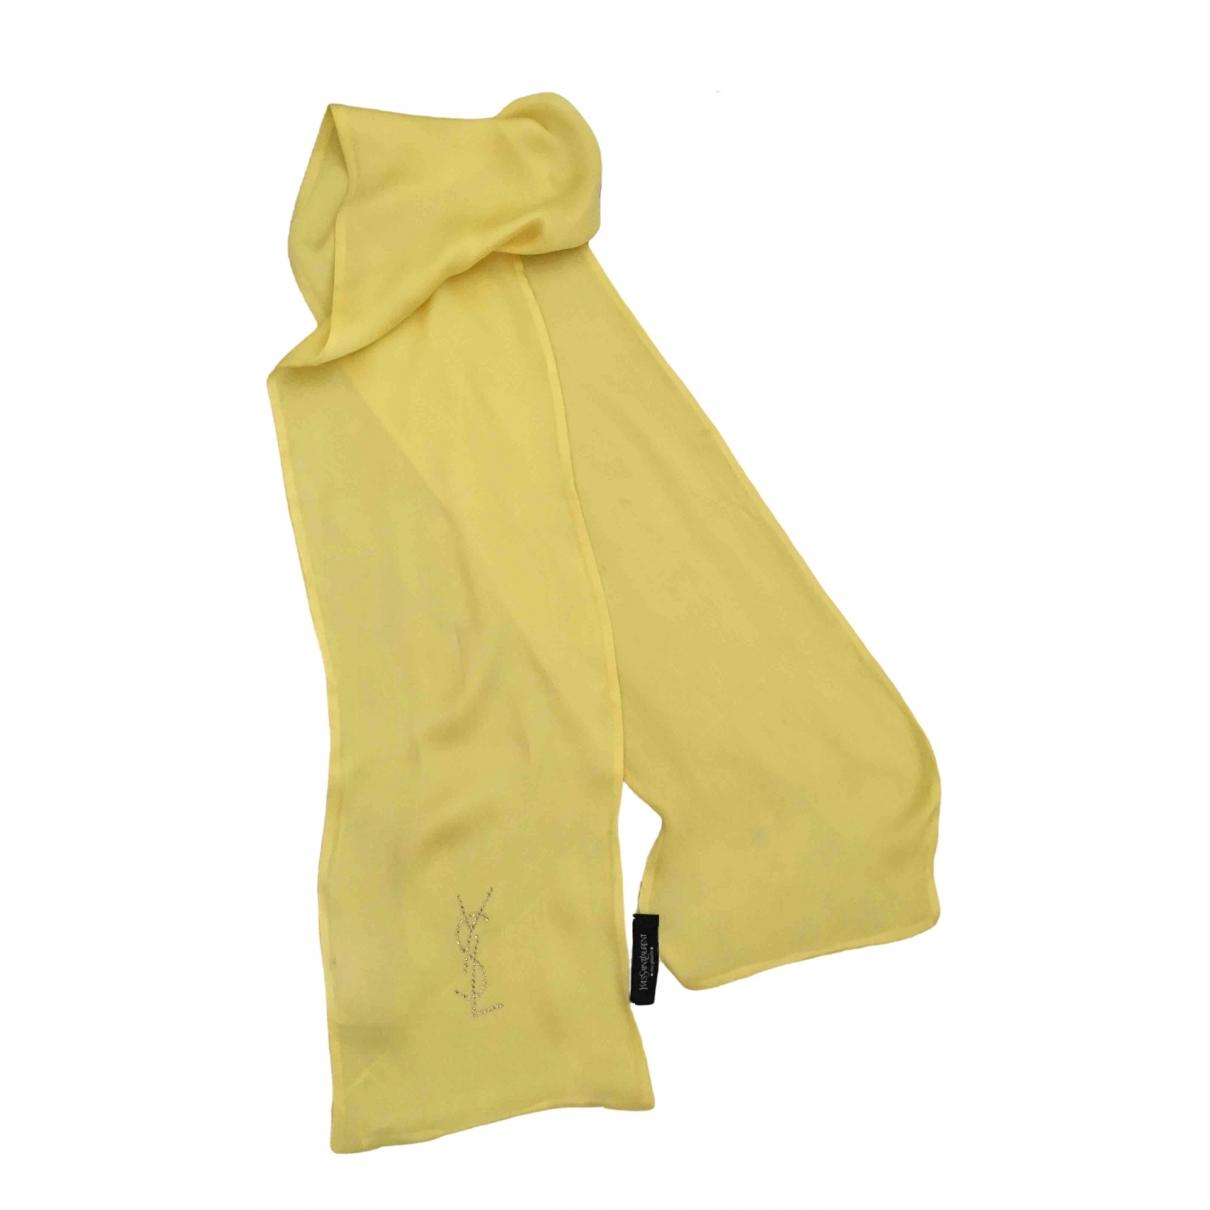 Yves Saint Laurent \N Yellow Silk scarf for Women \N